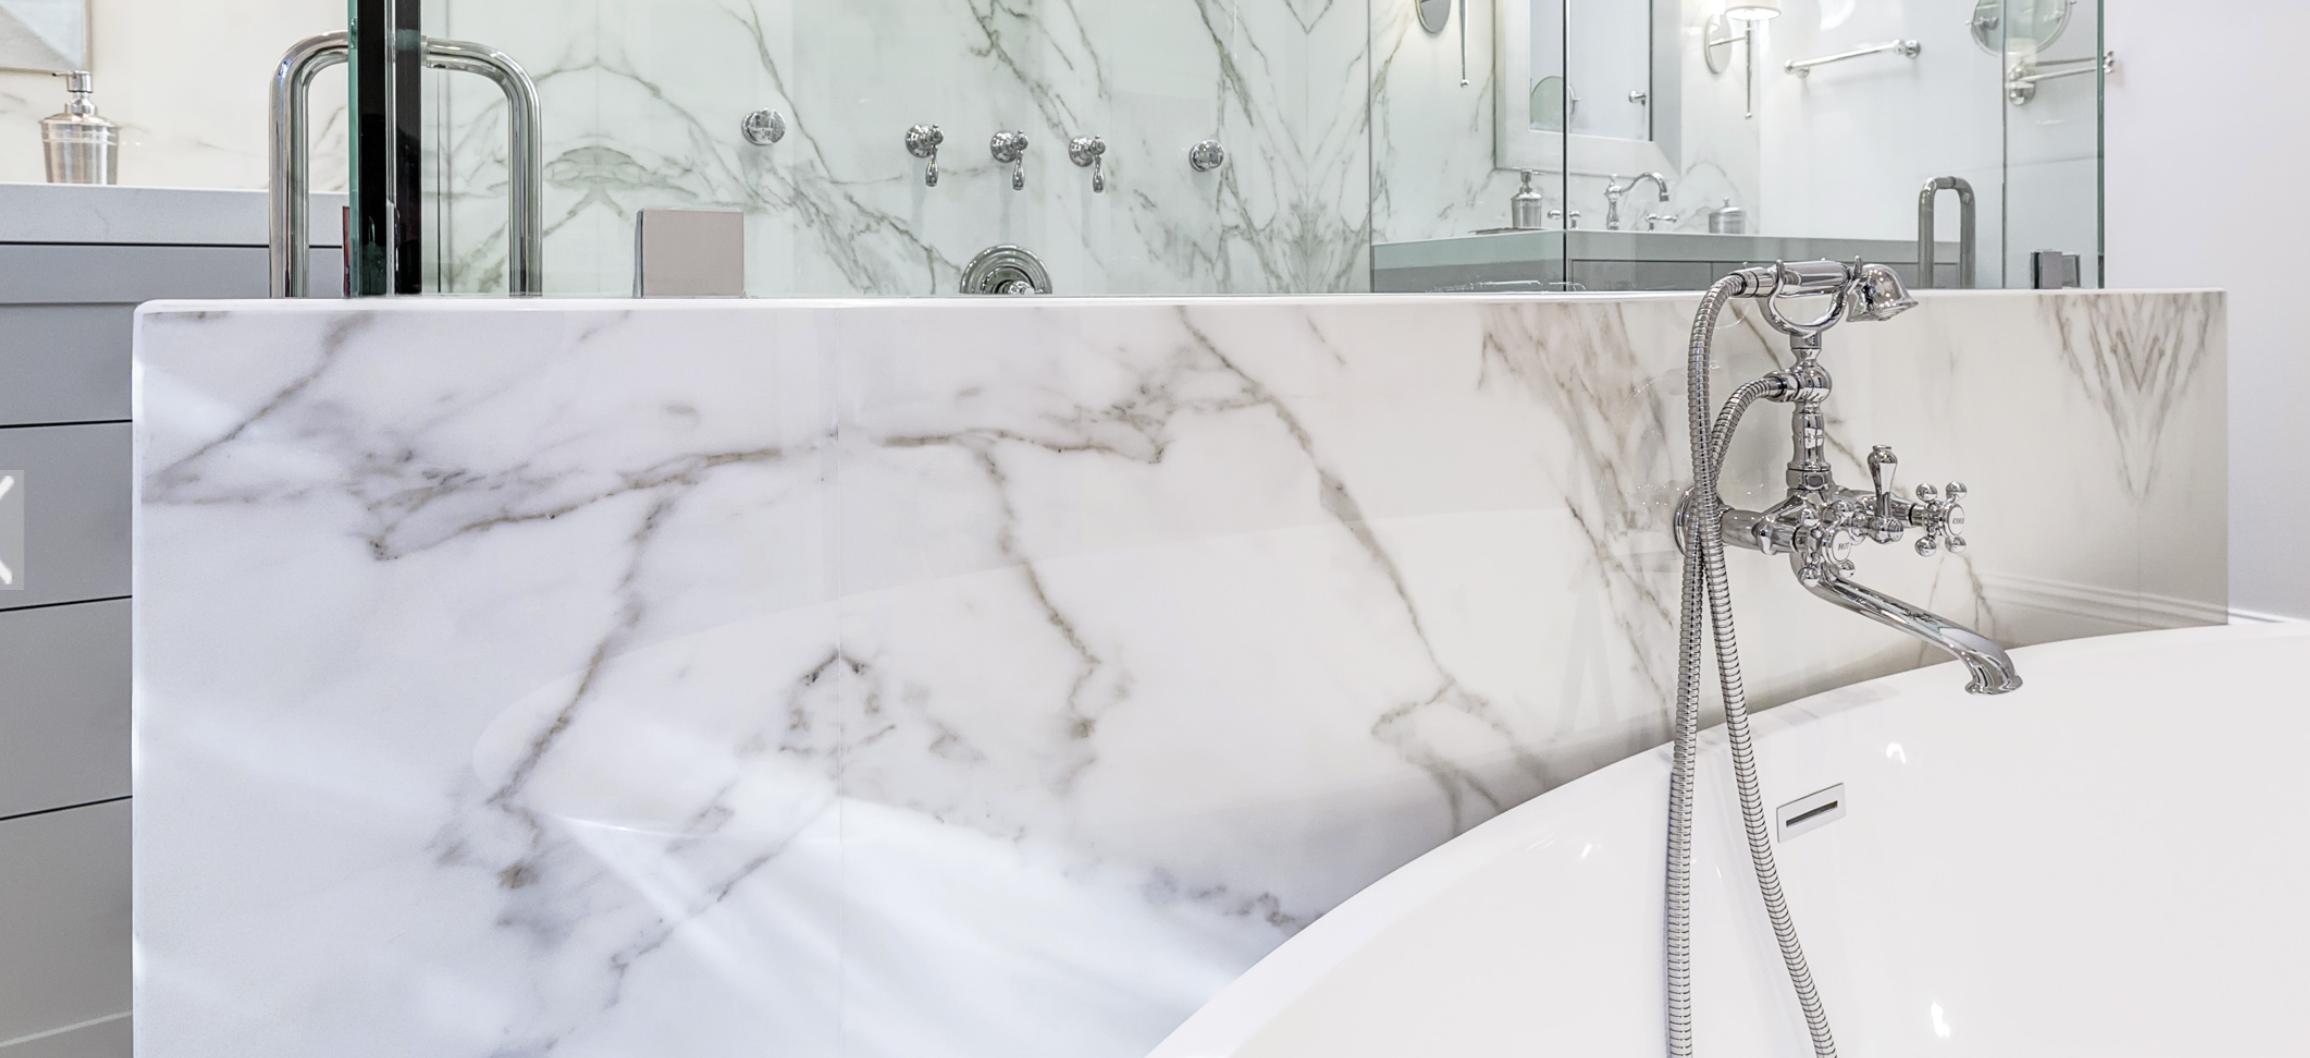 Neolith Porcelain for your Ottawa bathroom